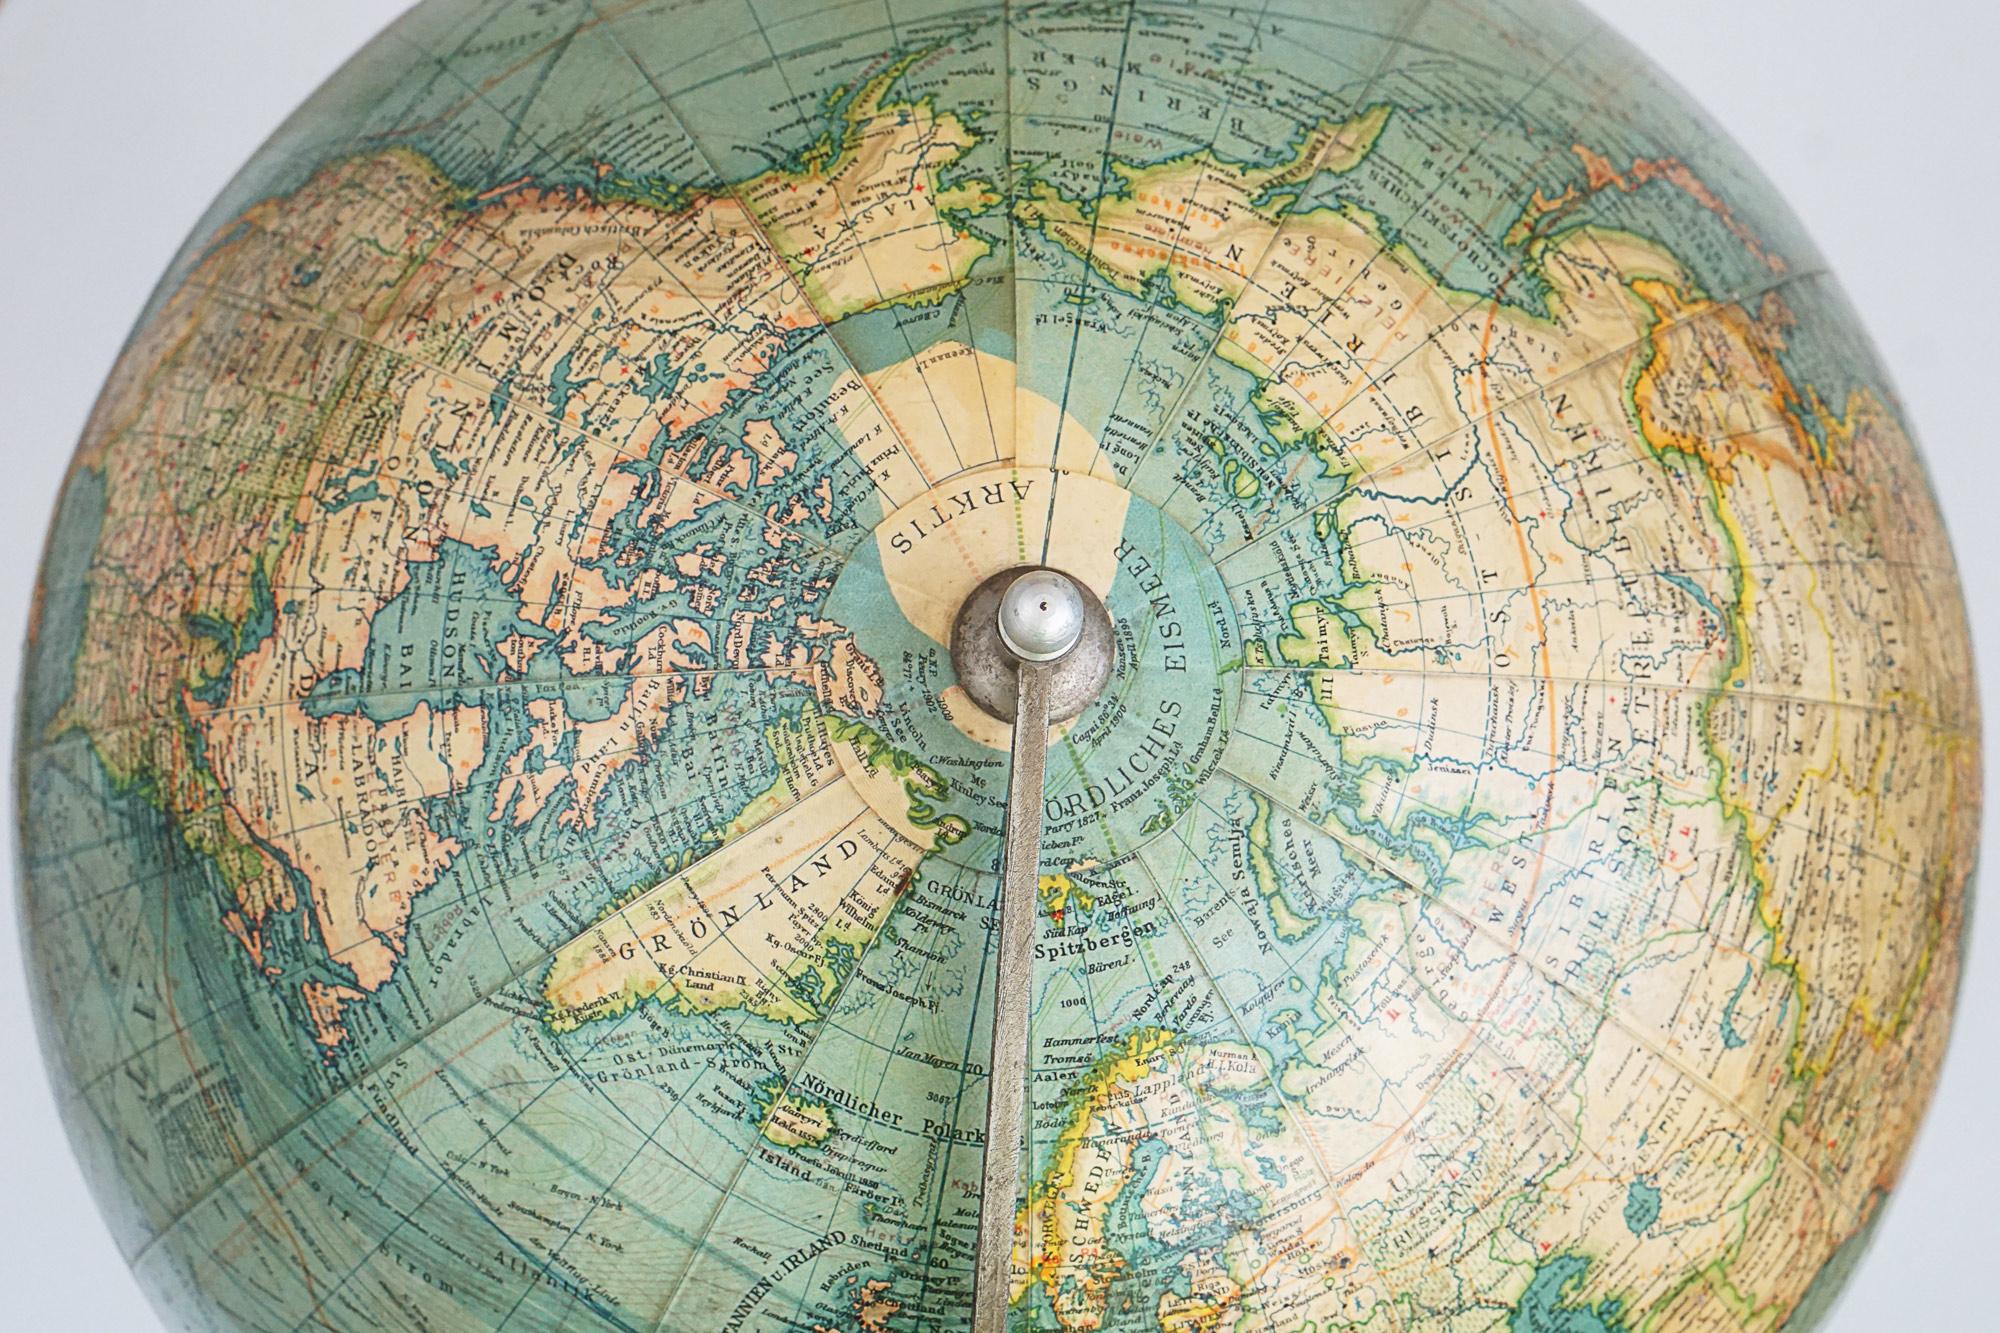 Mang's Neuer Erd-Globus